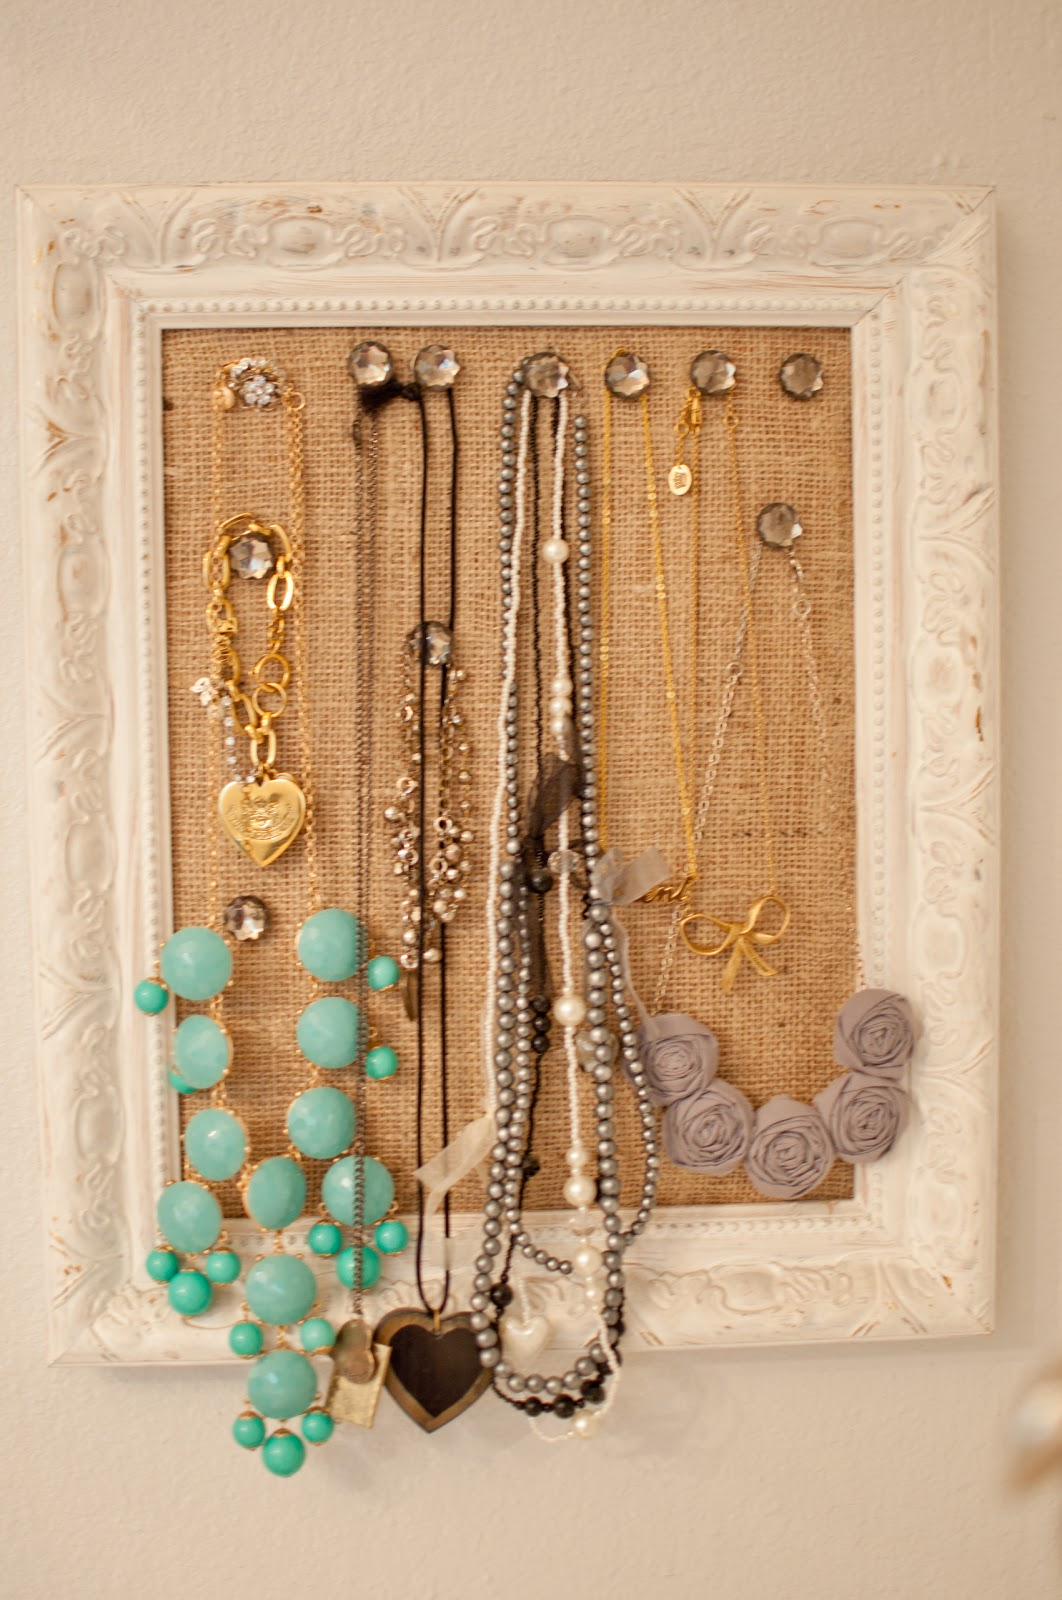 DIY Cork Board Jewelry Frame & Domestic Fashionista: DIY Cork Board Jewelry Frame